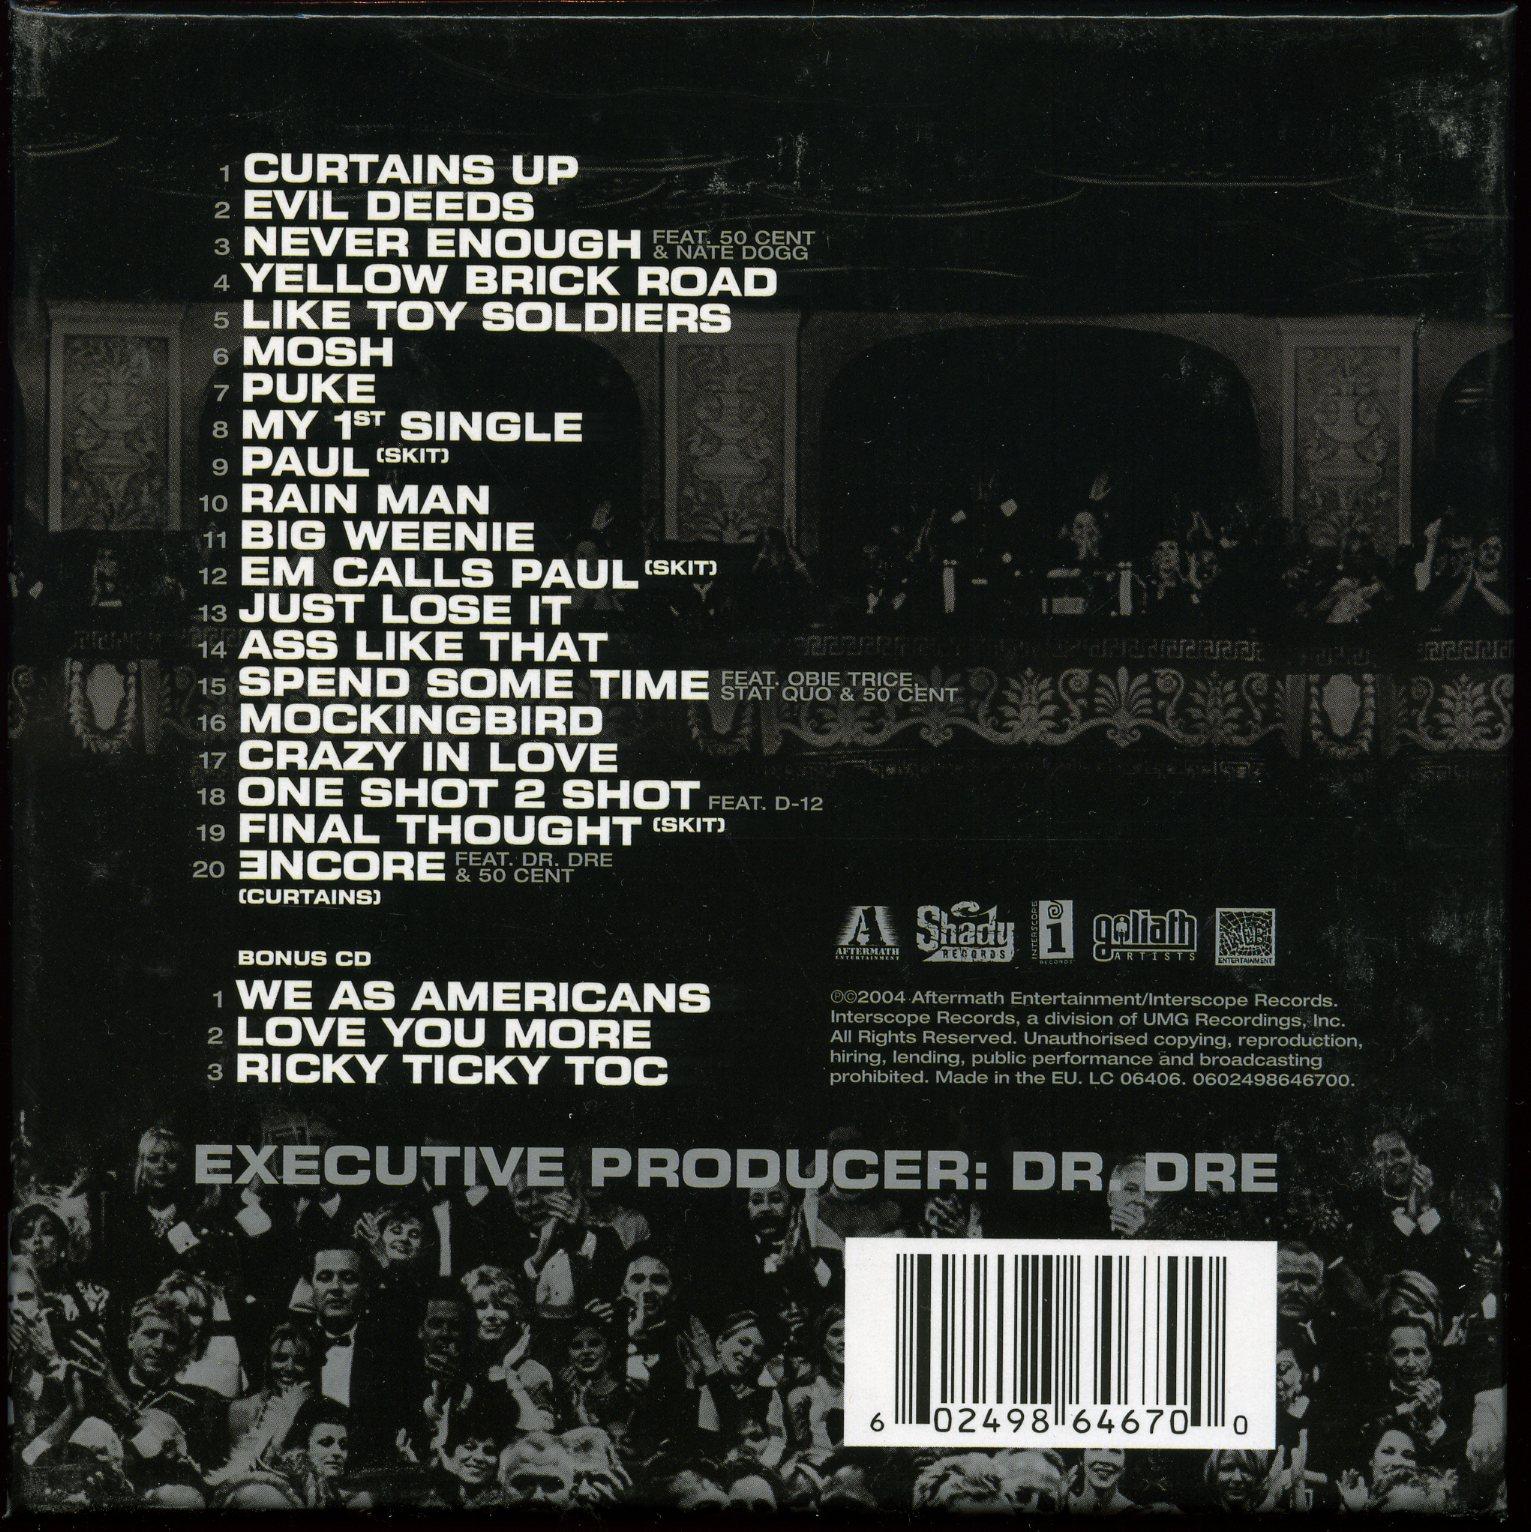 Eminem encore special edition